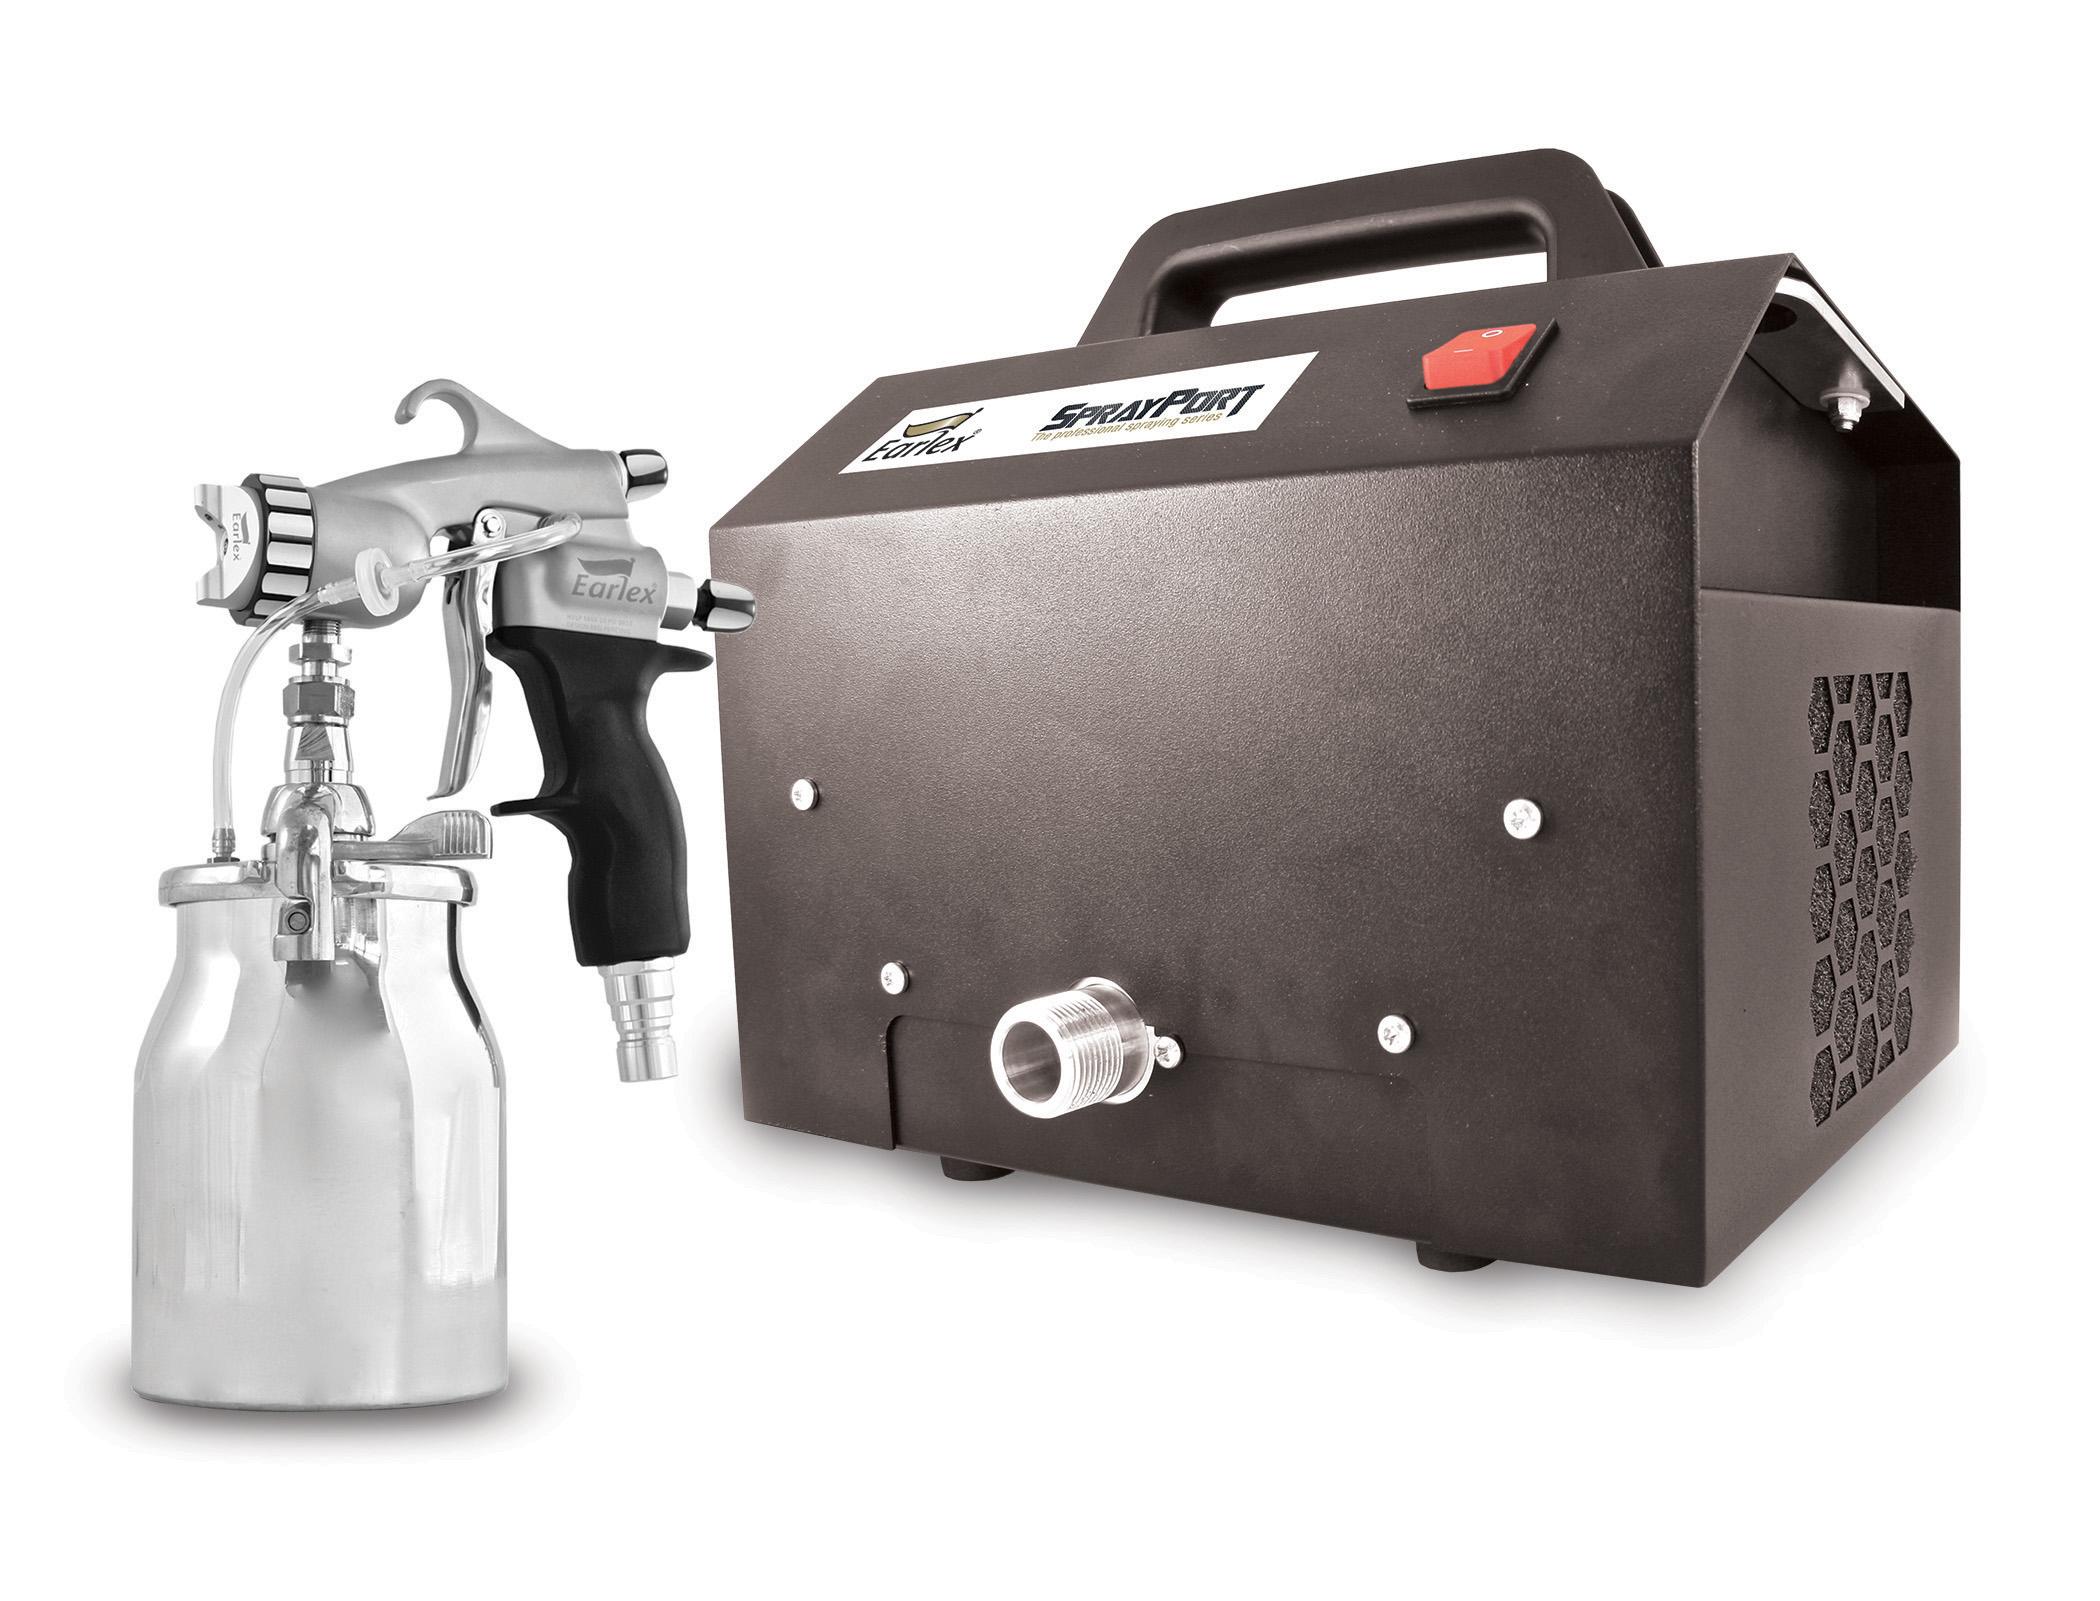 Spray Port 6003 with pressure feed Pro 8 spray gun